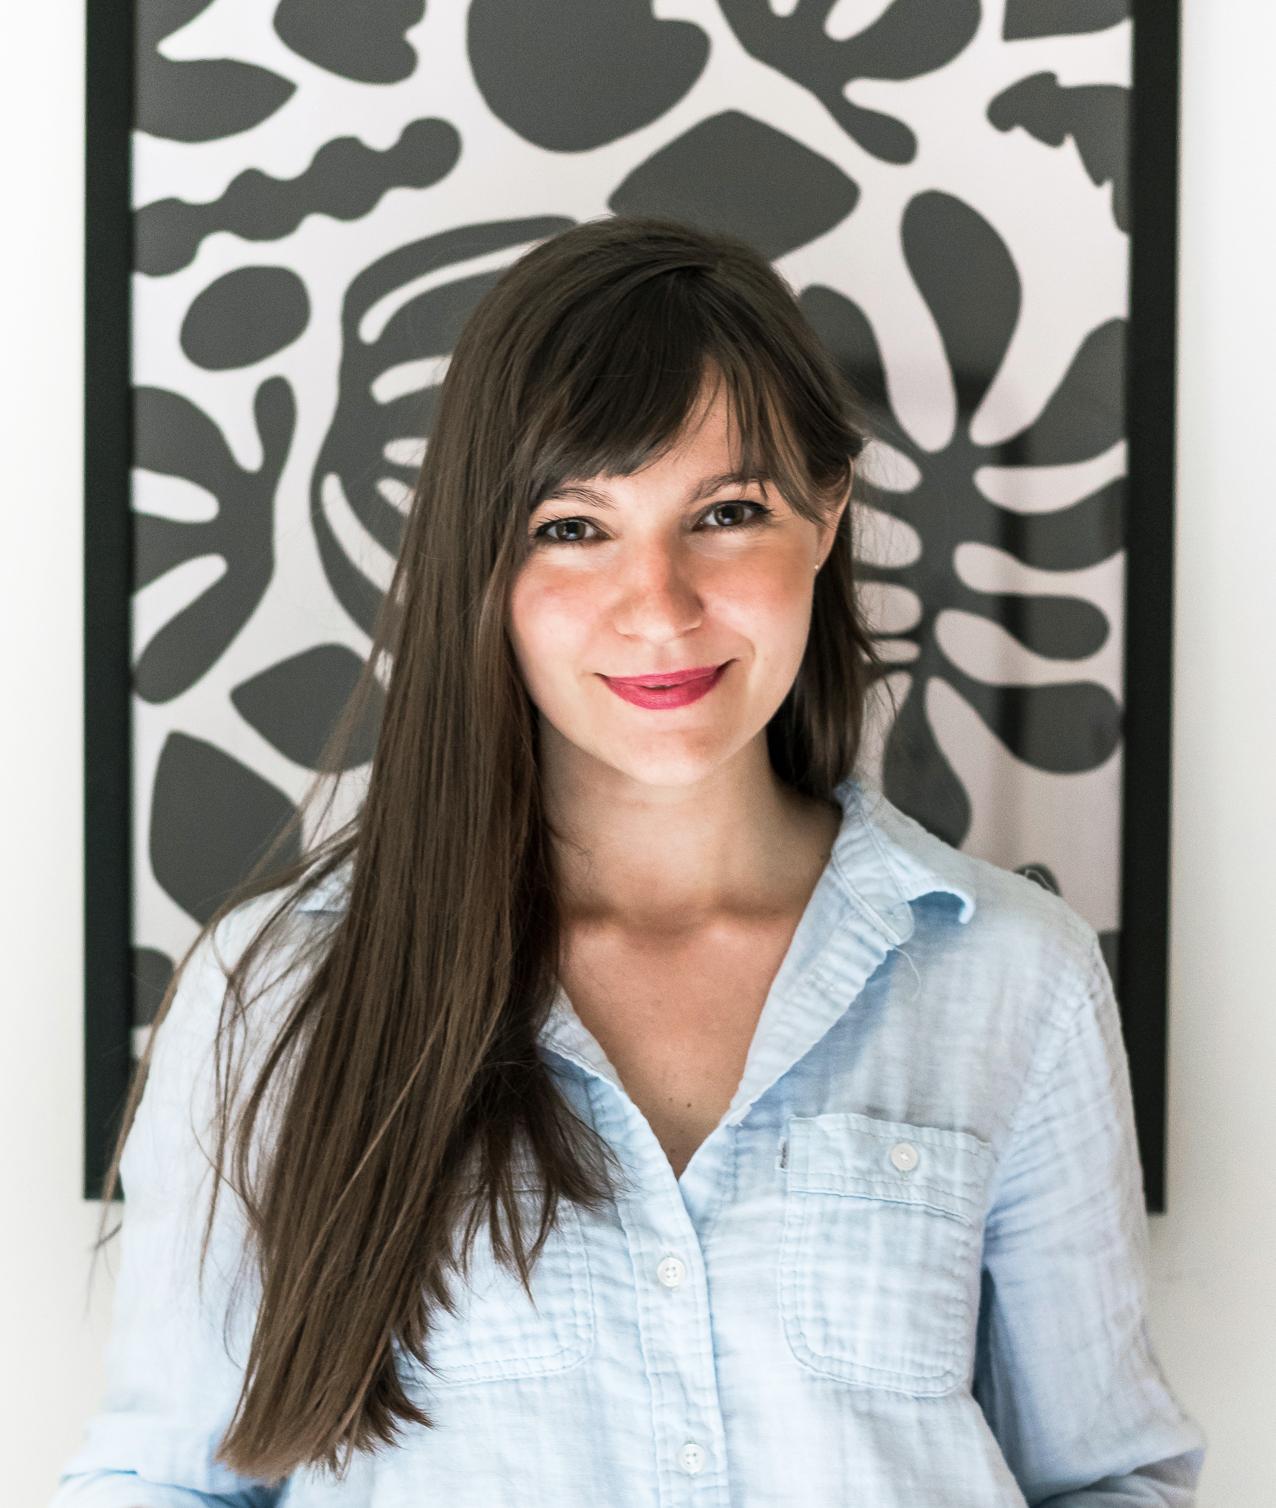 Kate Zaremba